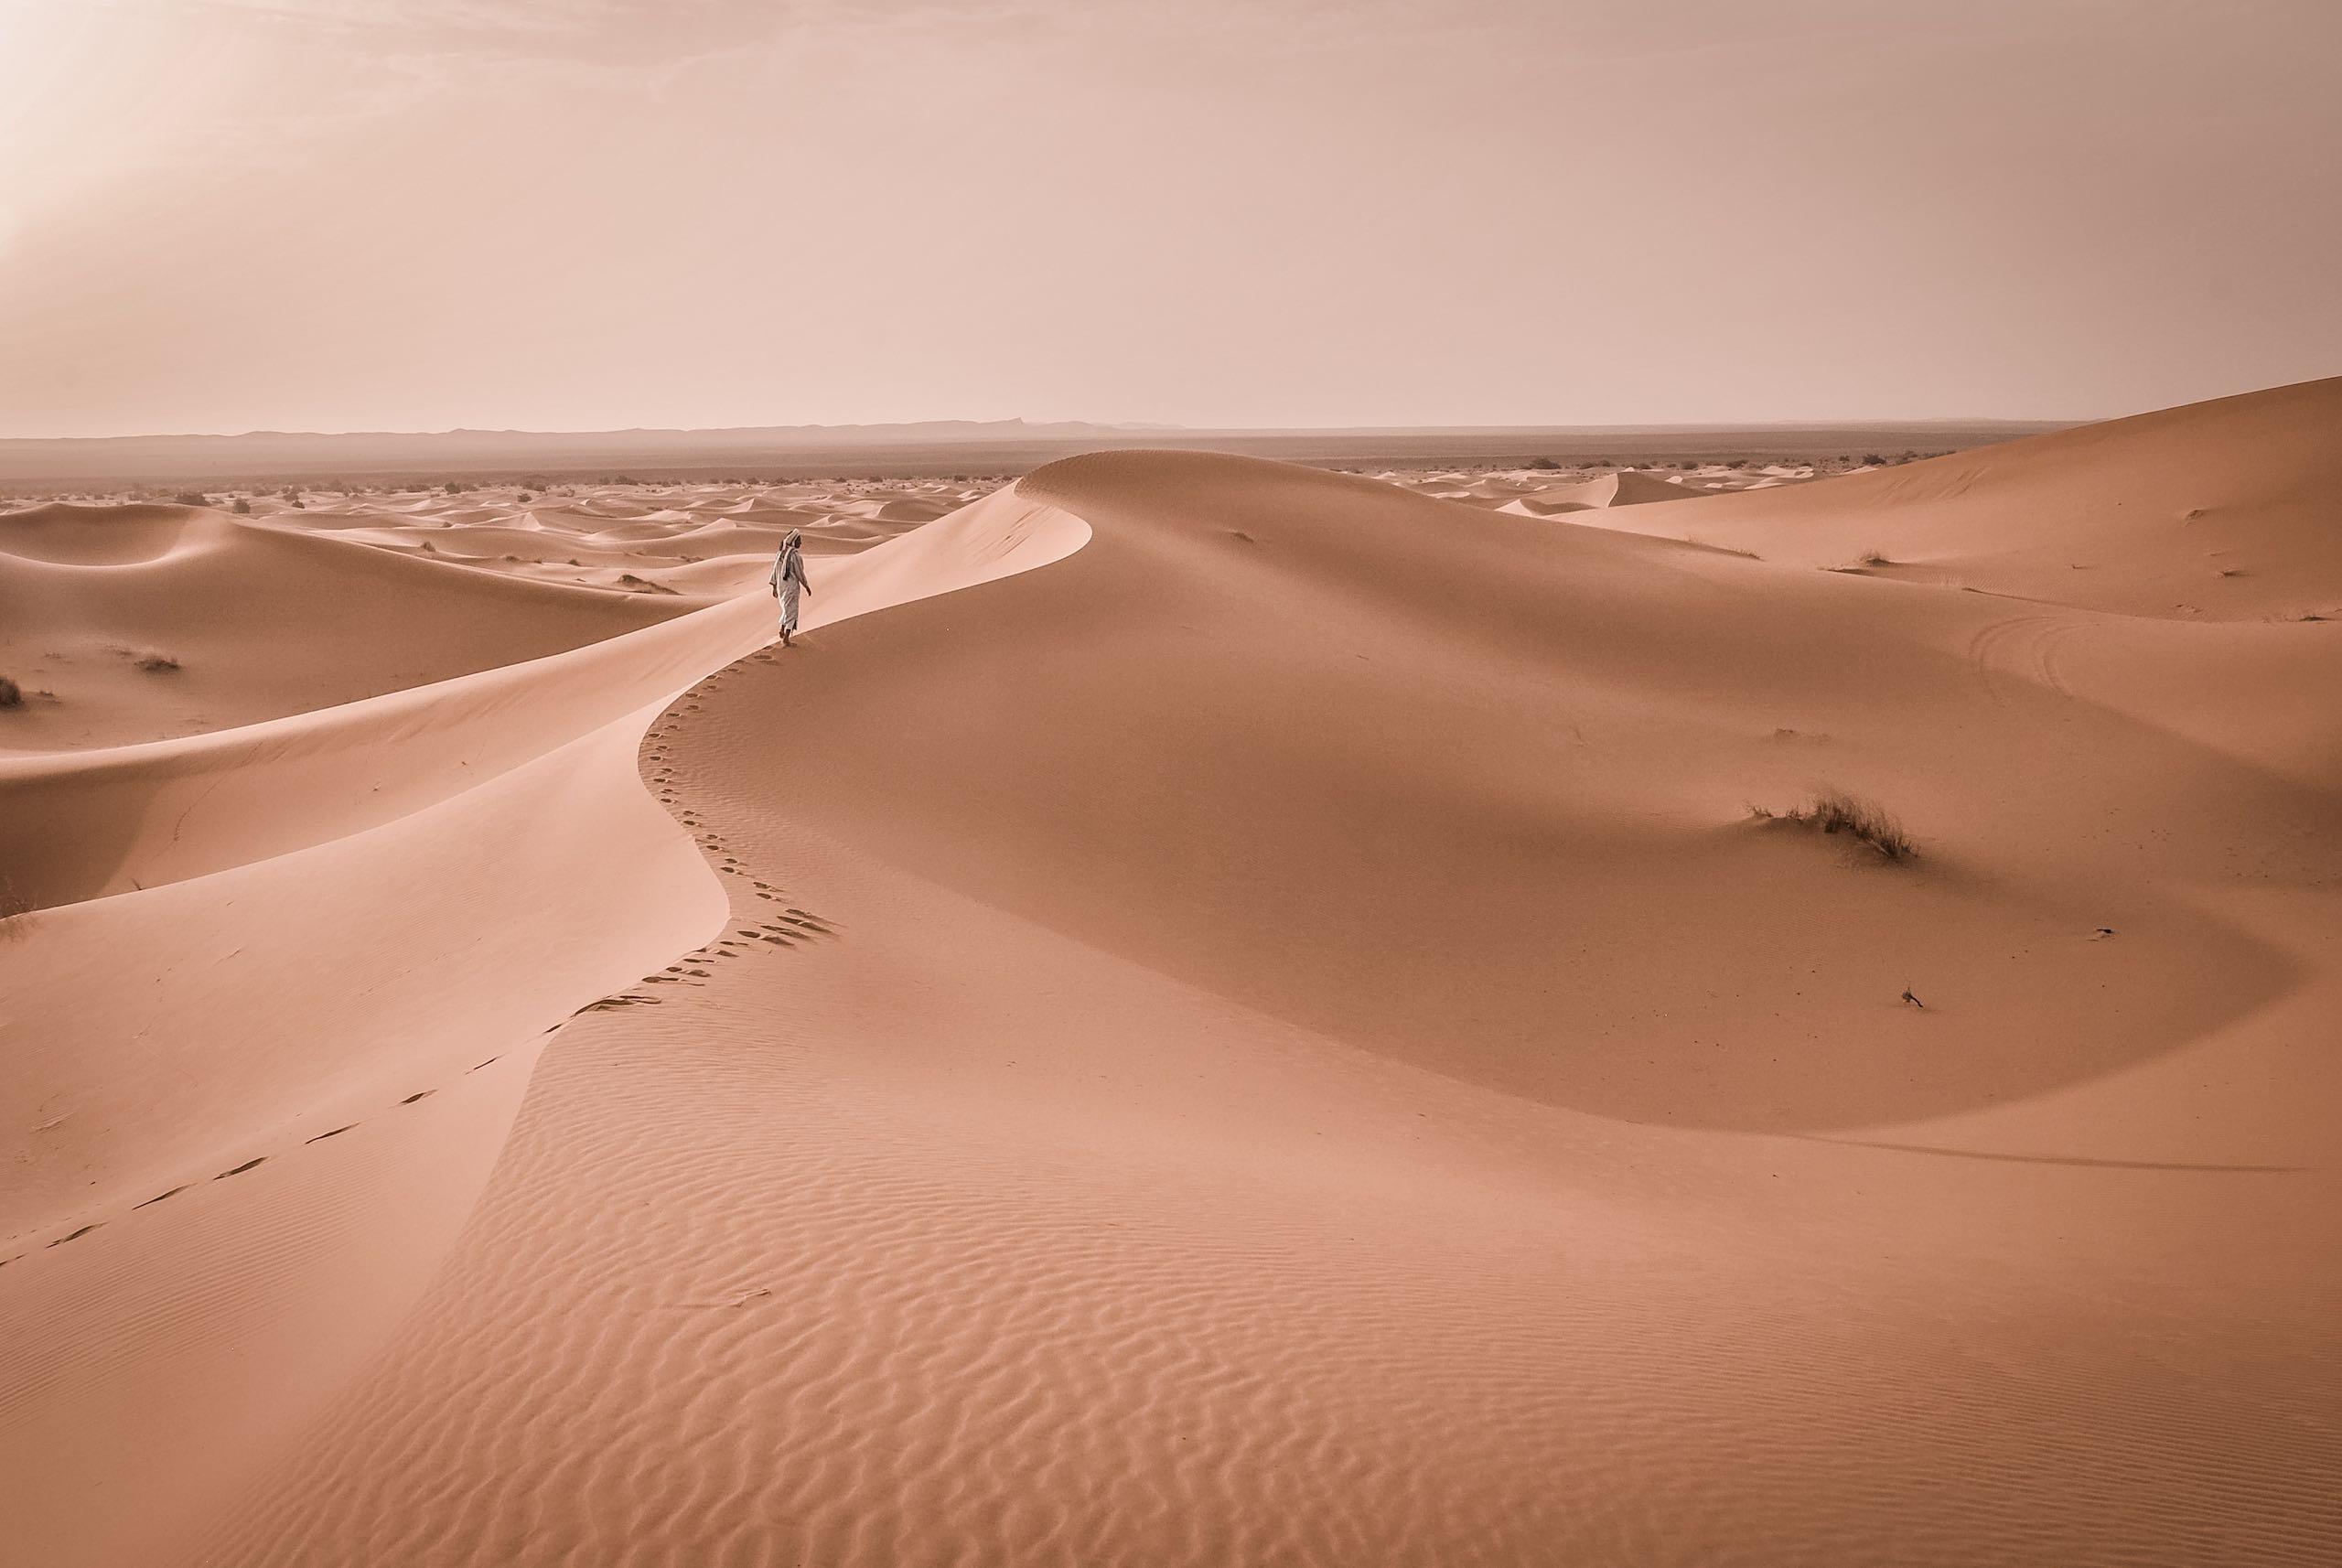 Judd's trip to Morocco